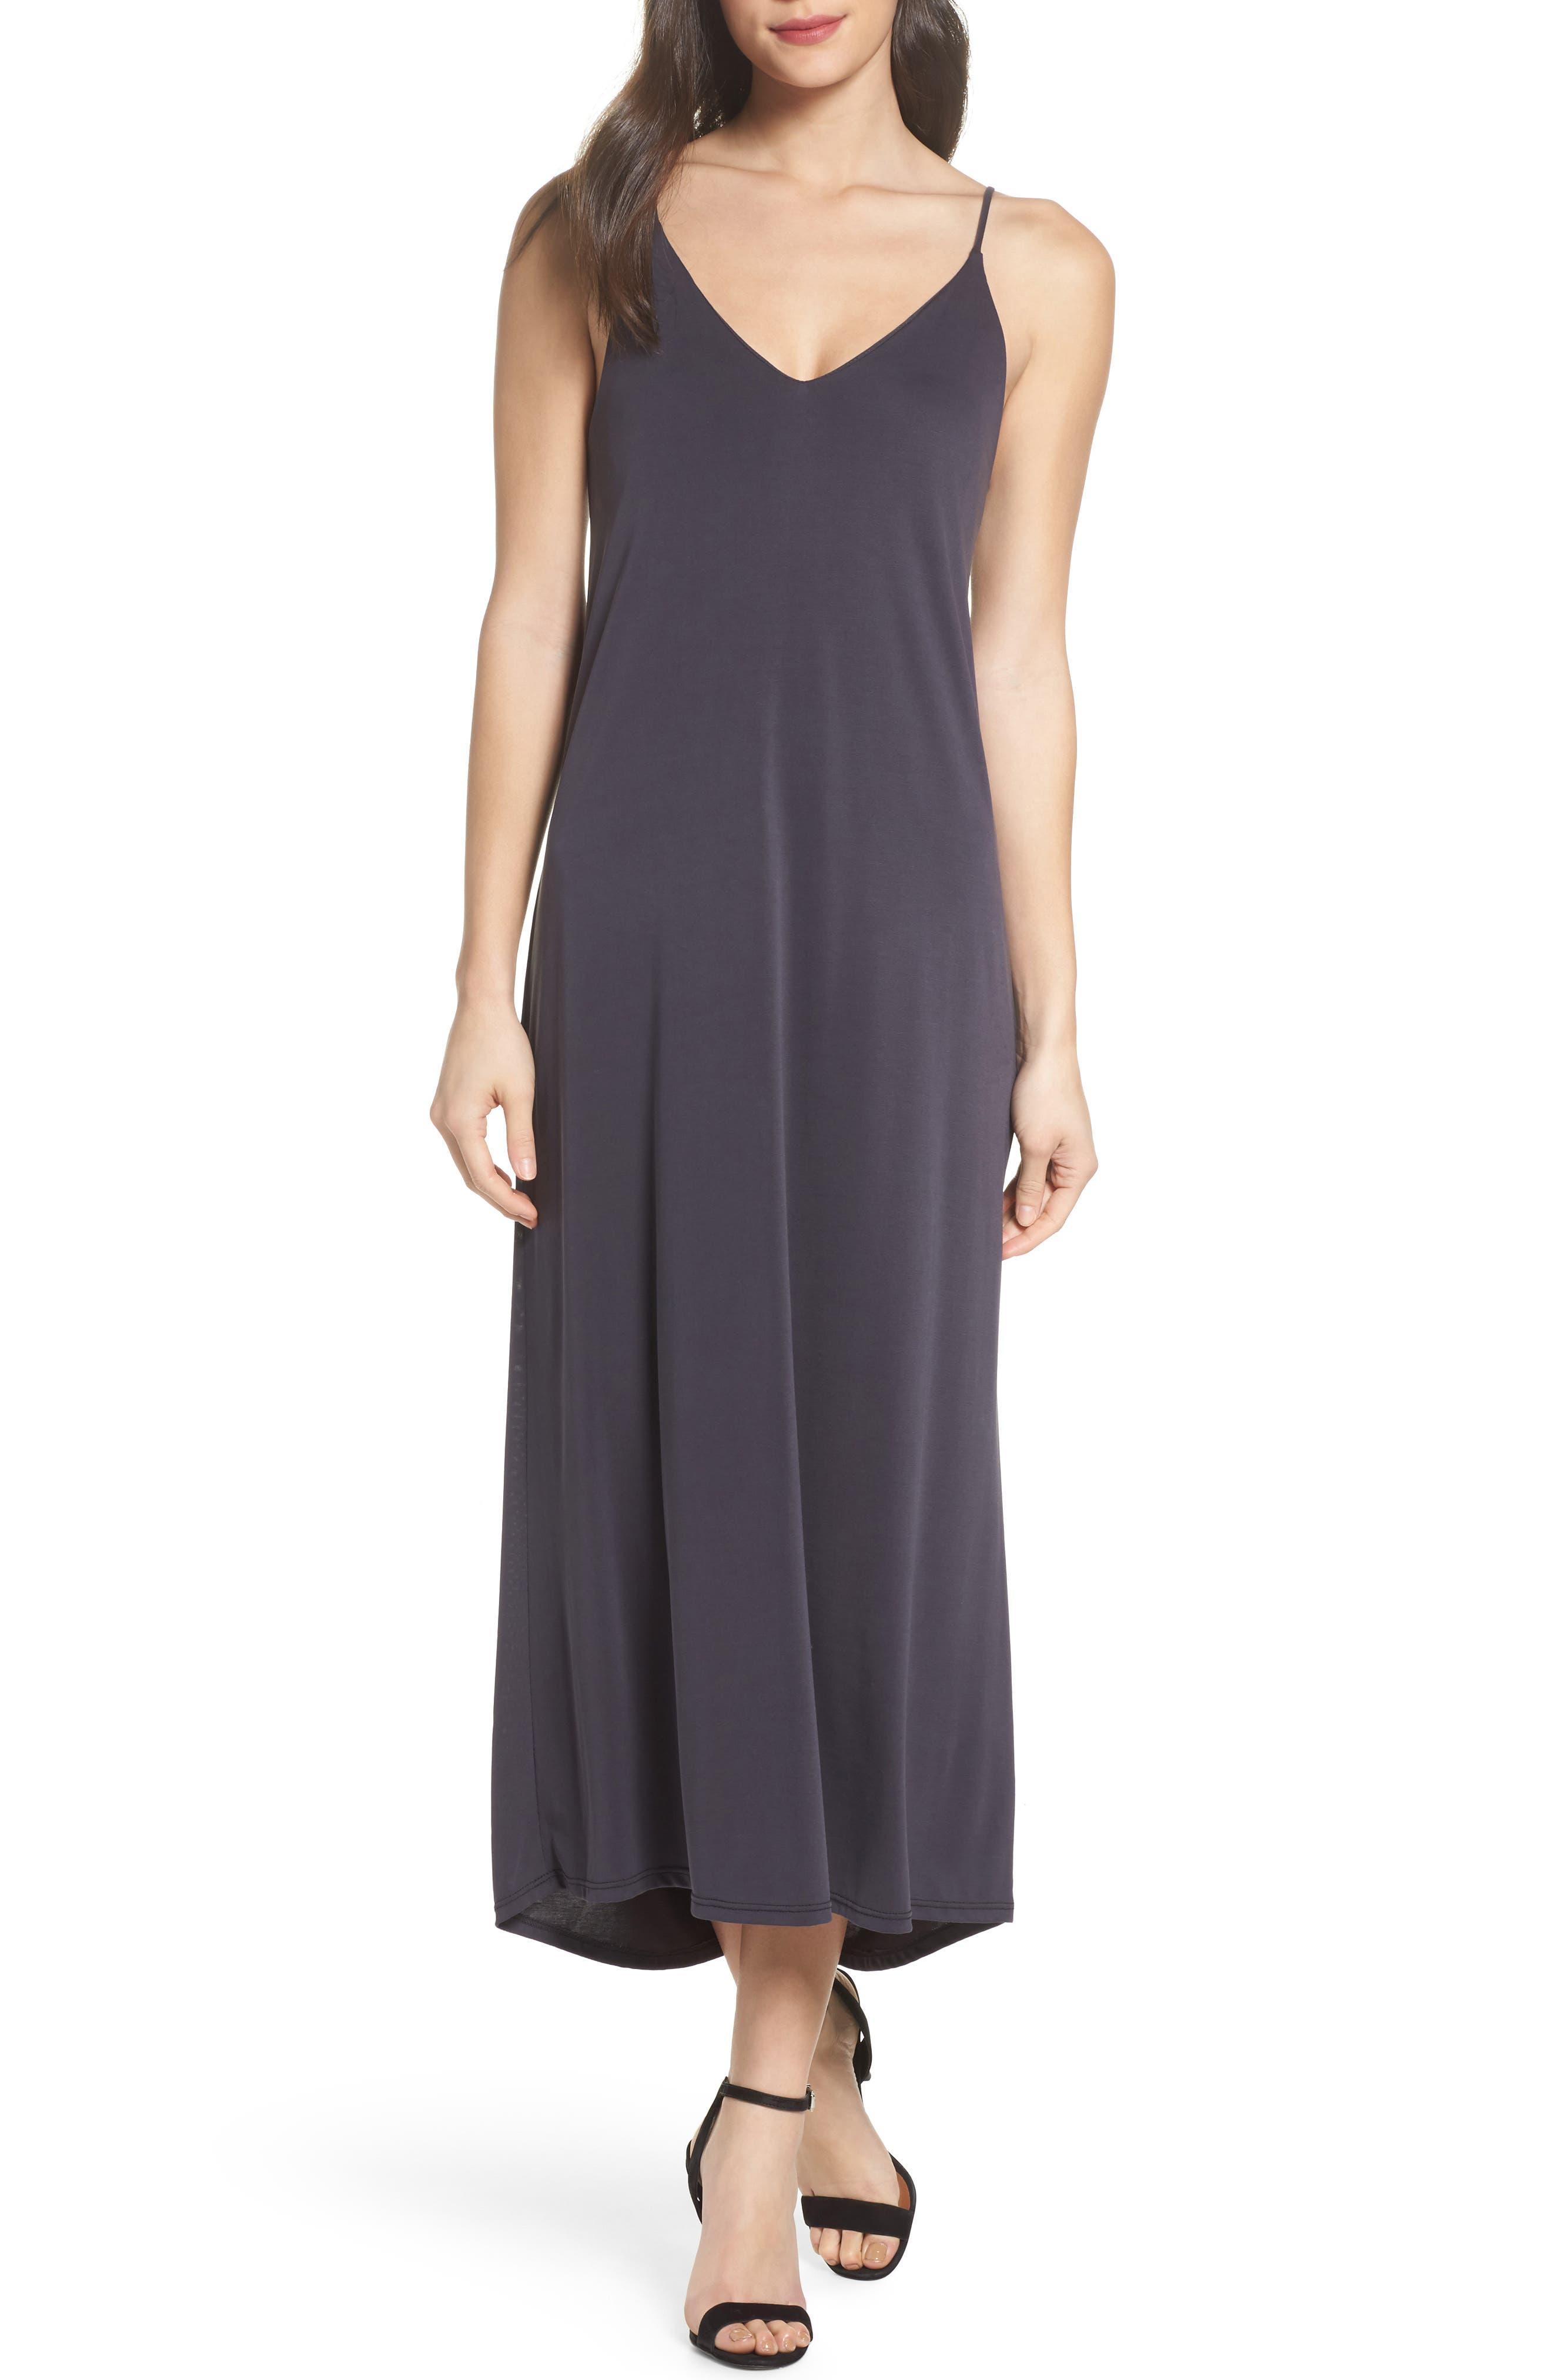 Mary & Mabel Knit Maxi Dress